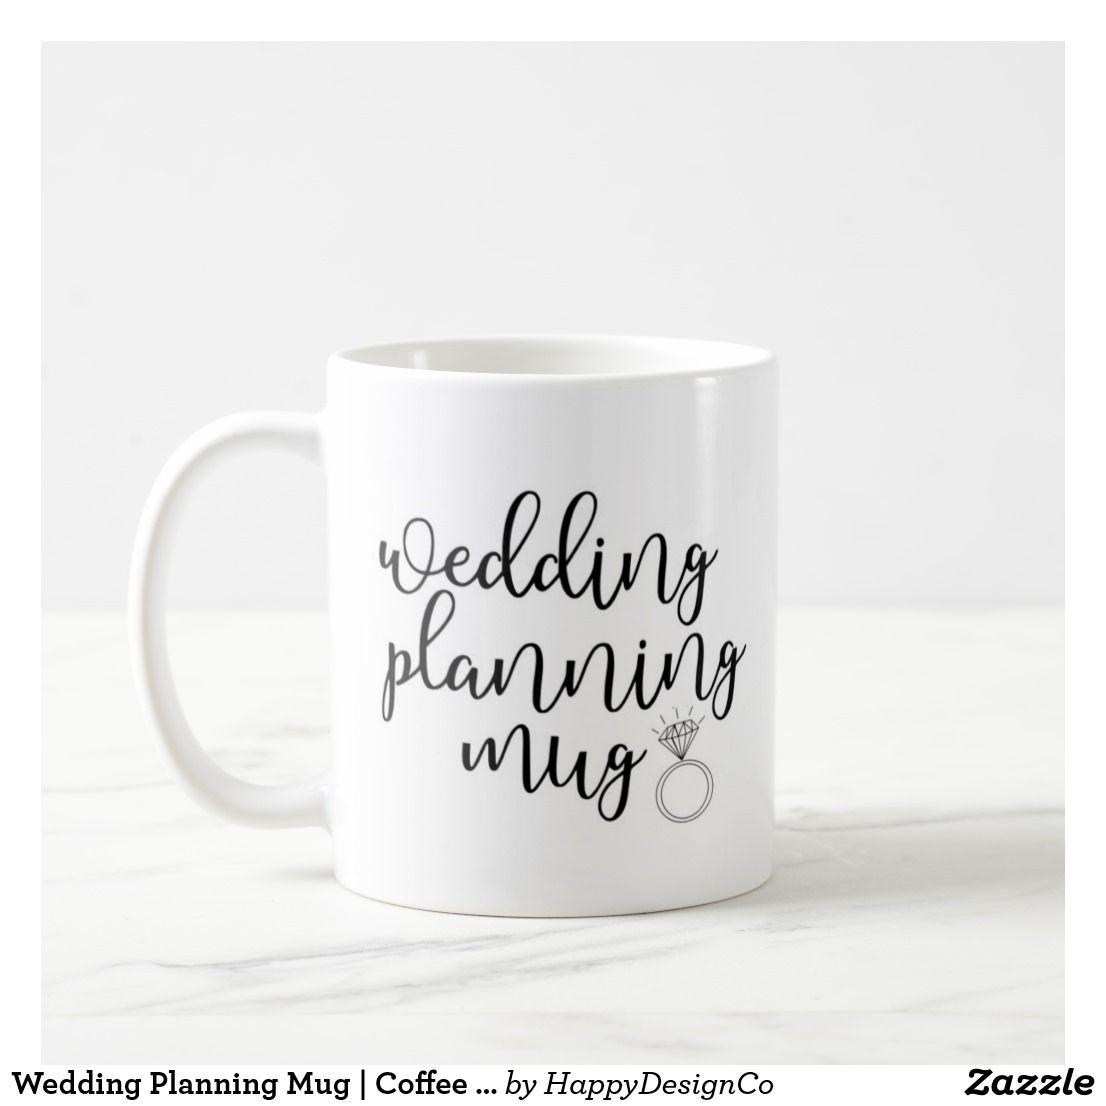 Wedding Planning Mug | Coffee Mug Will You Be My Bridesmaid? Cactus ...